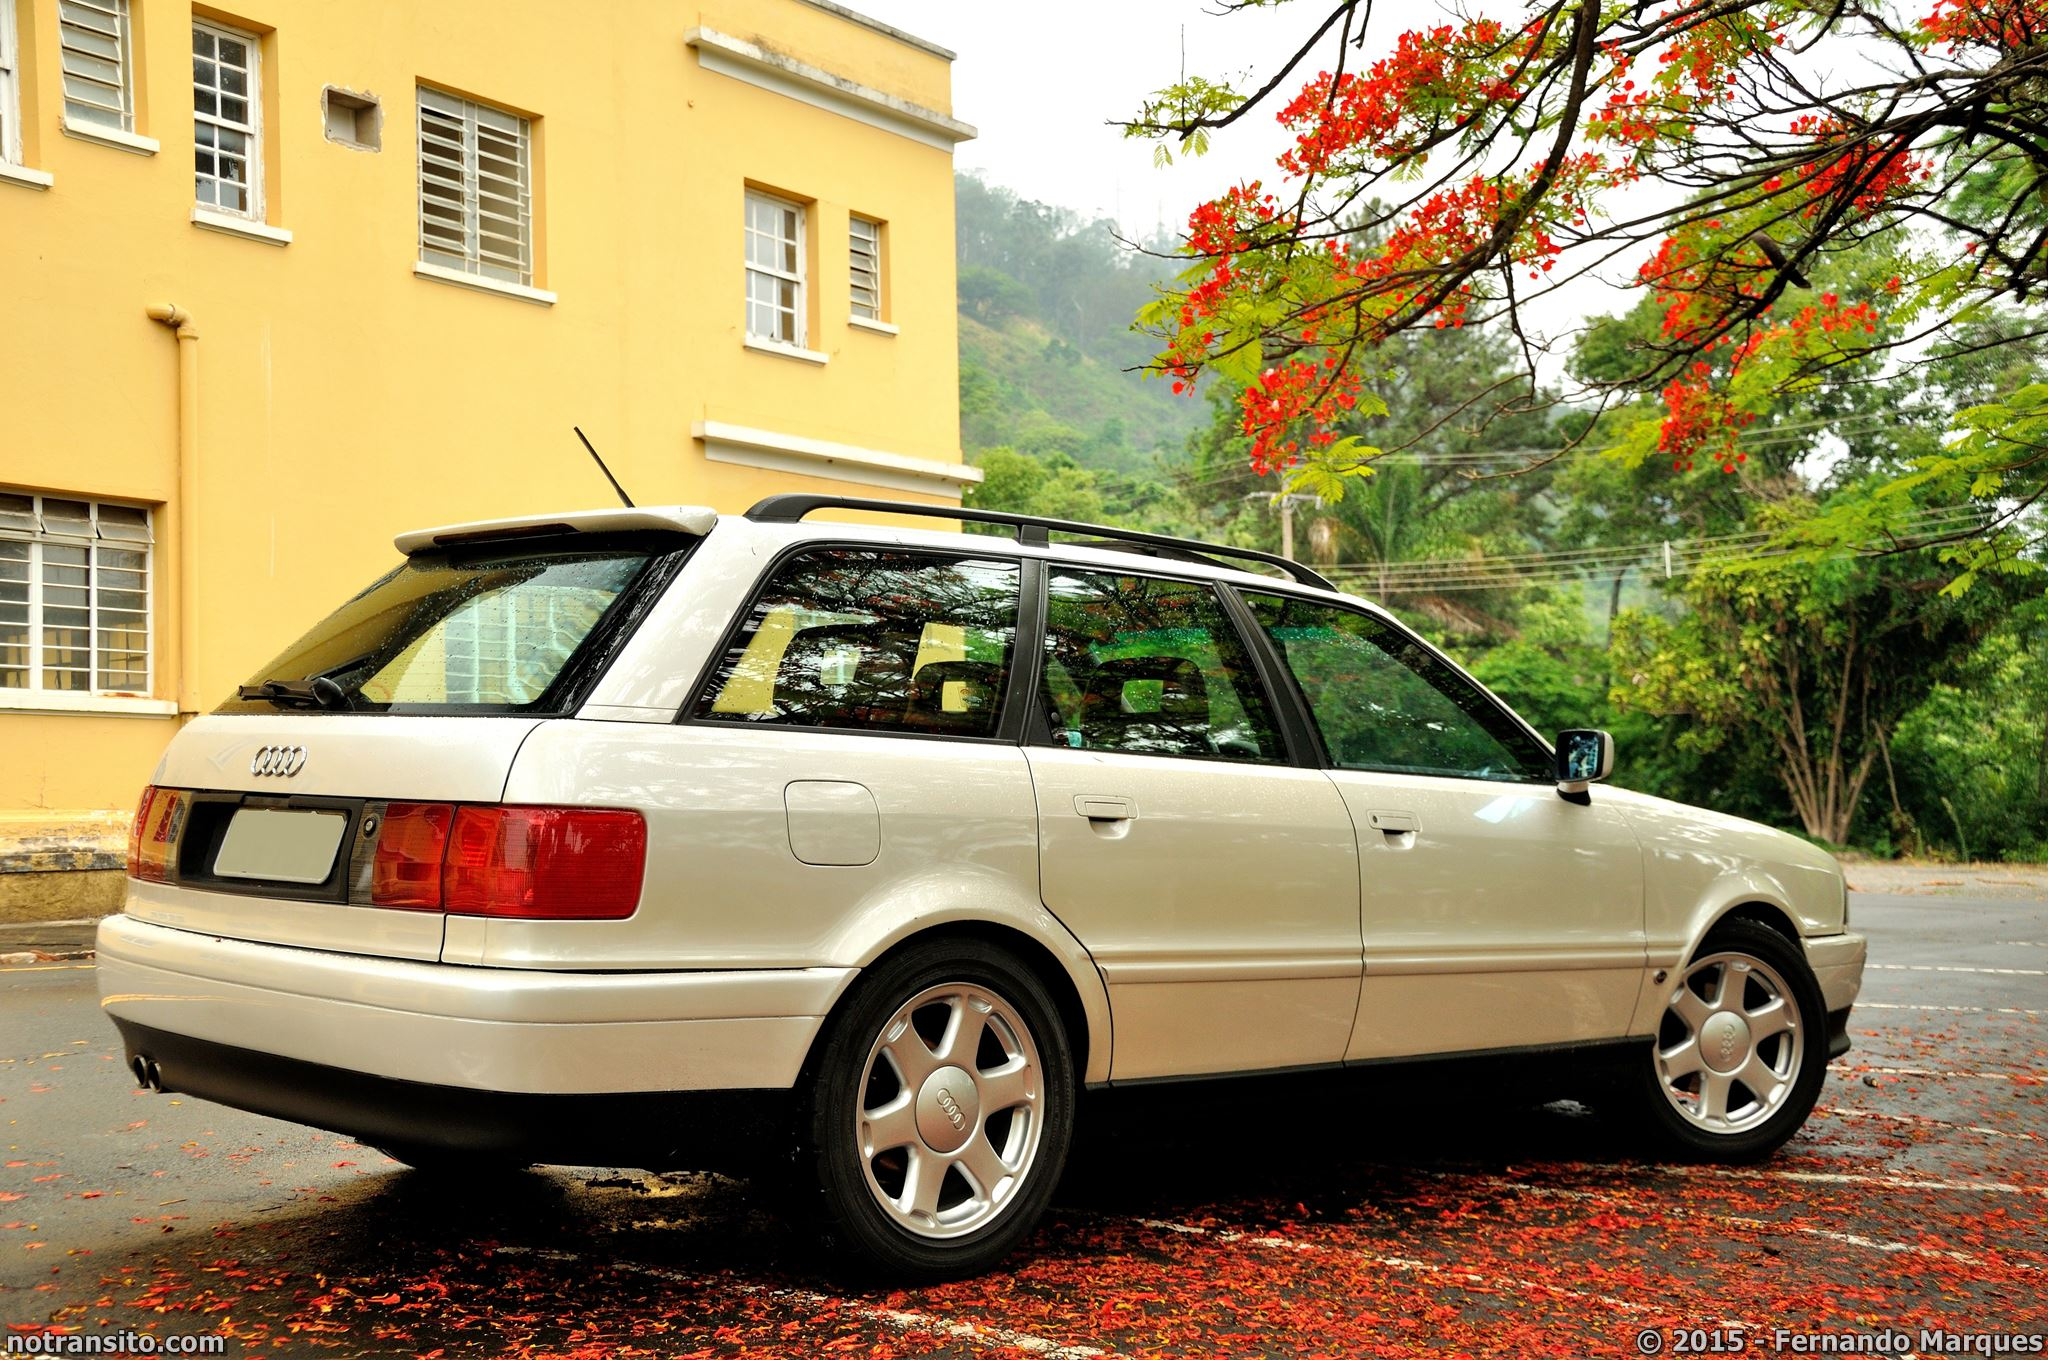 Audi 80 Avant Pearl White Metallic Tricoat, Águas de Lindóia